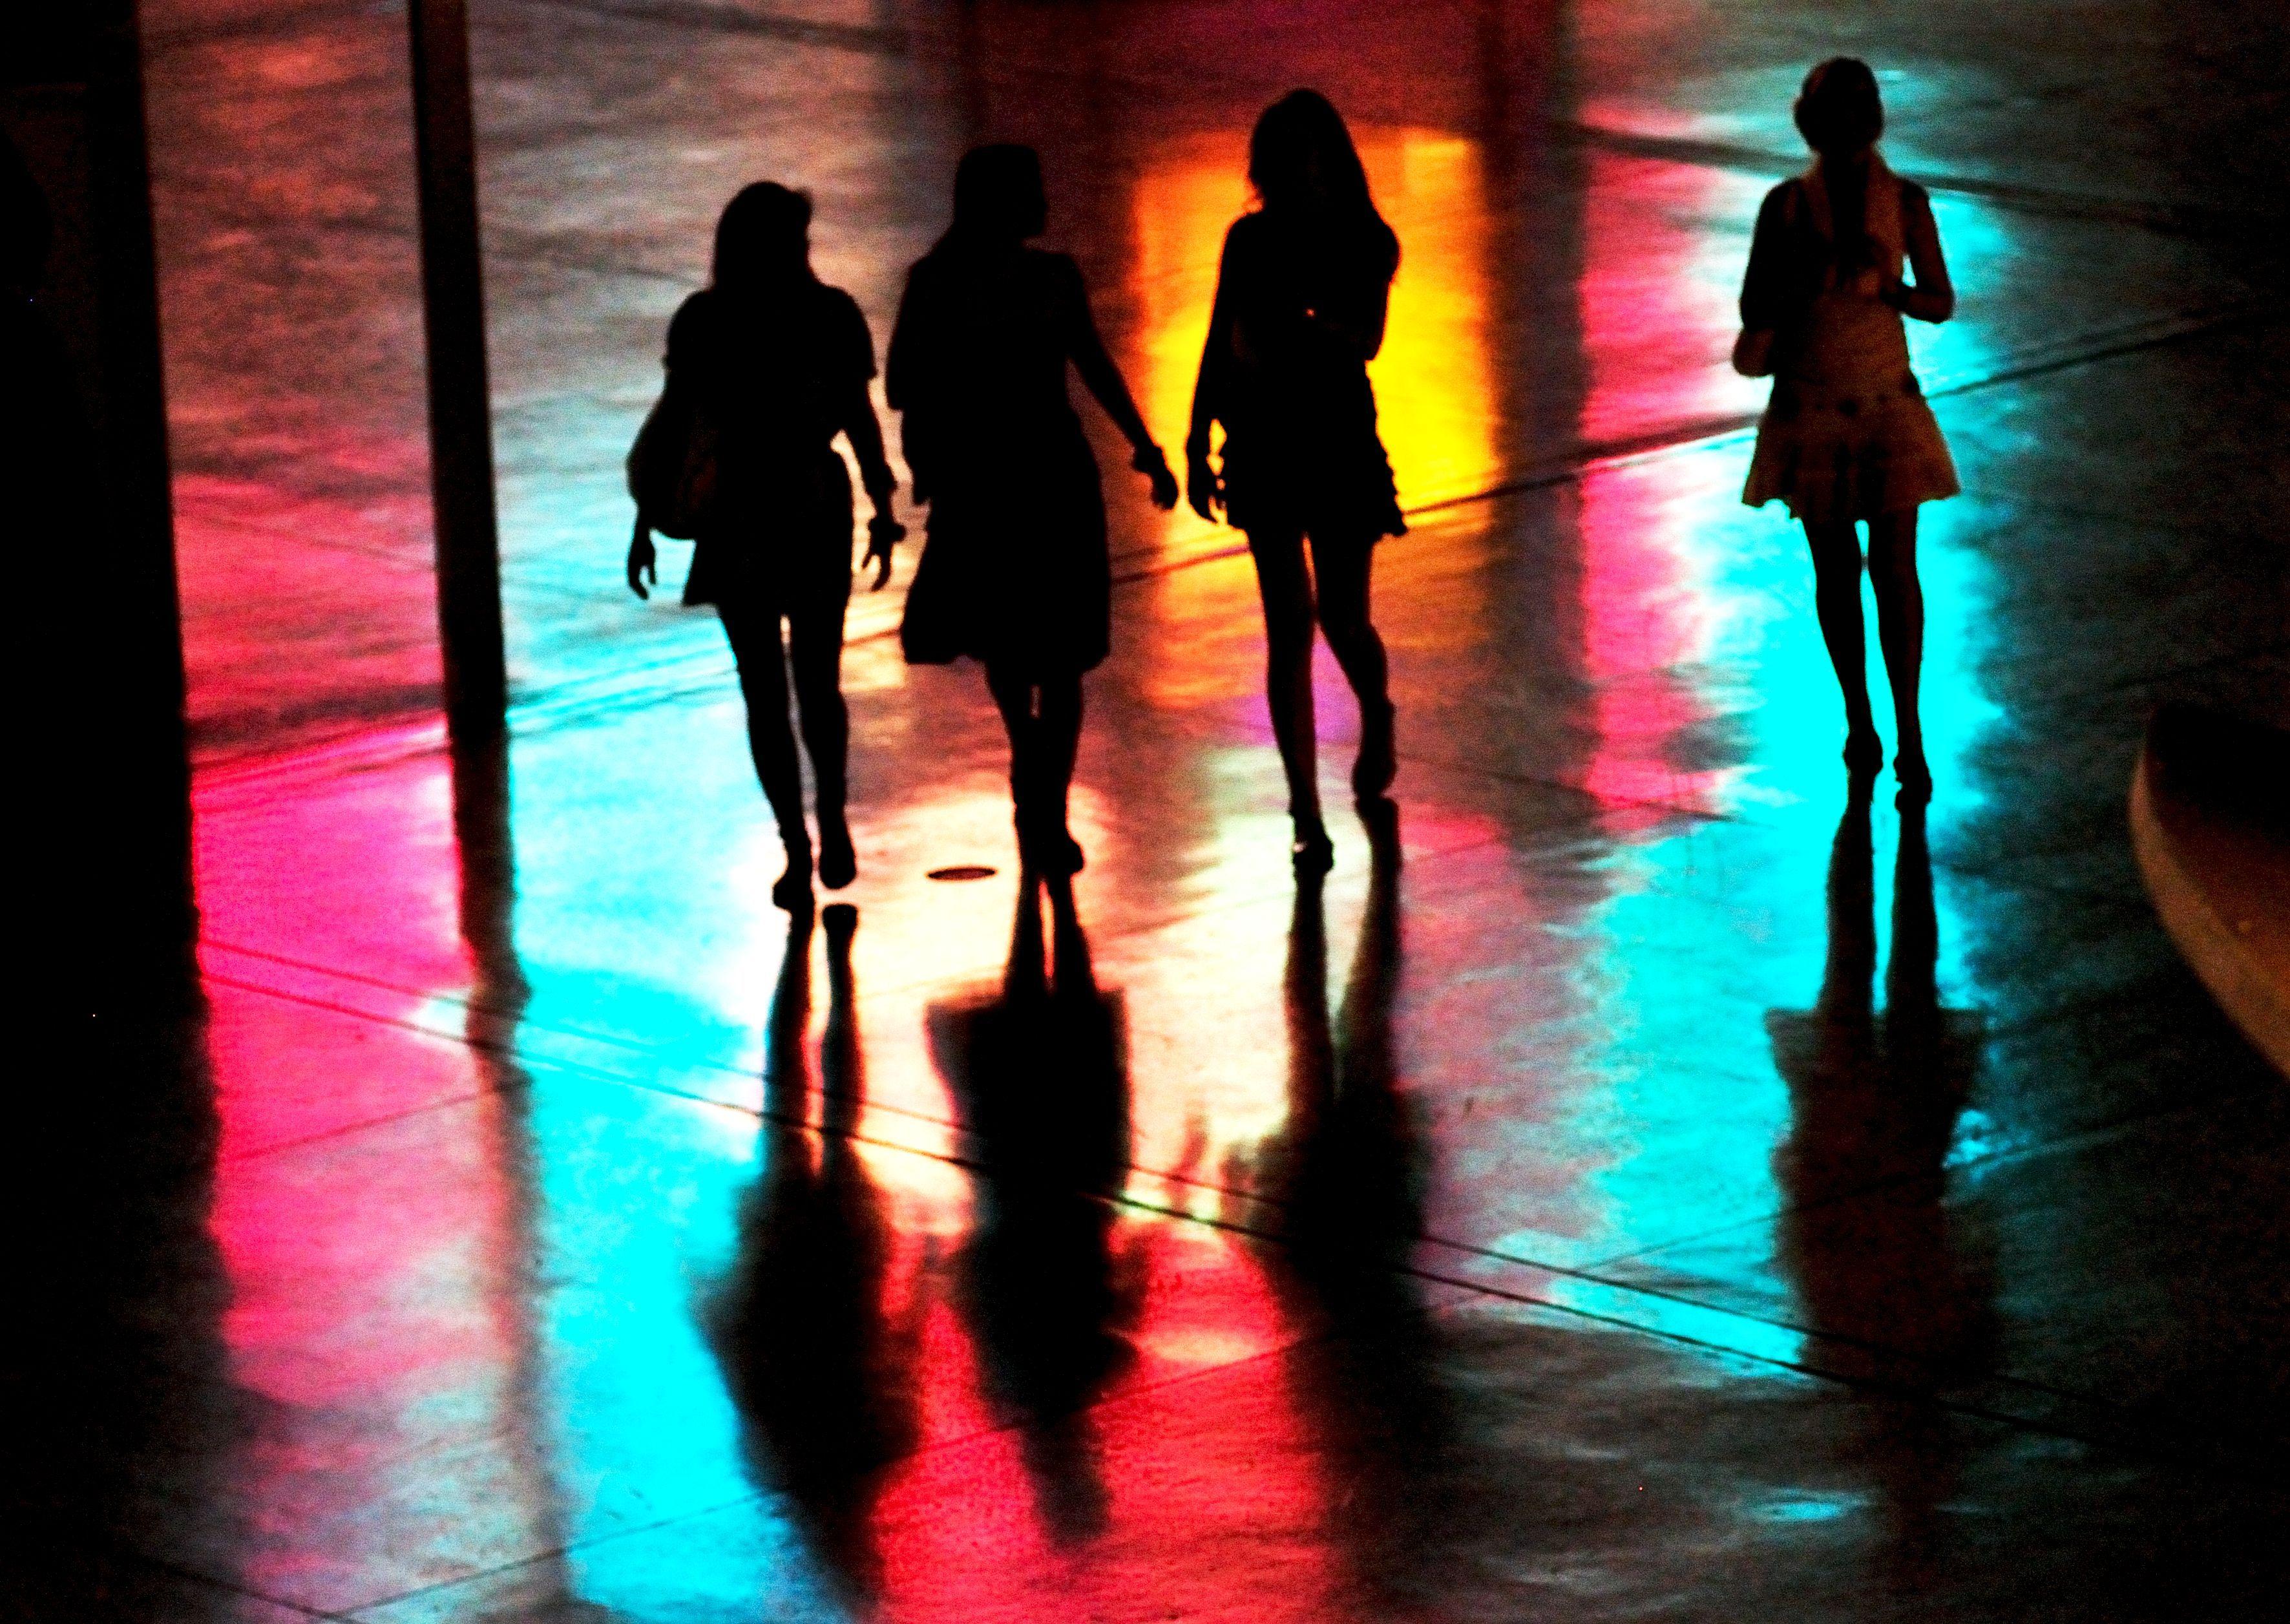 Porno kategoriat suomi porno sivut sex helsinki estonian escort girls.